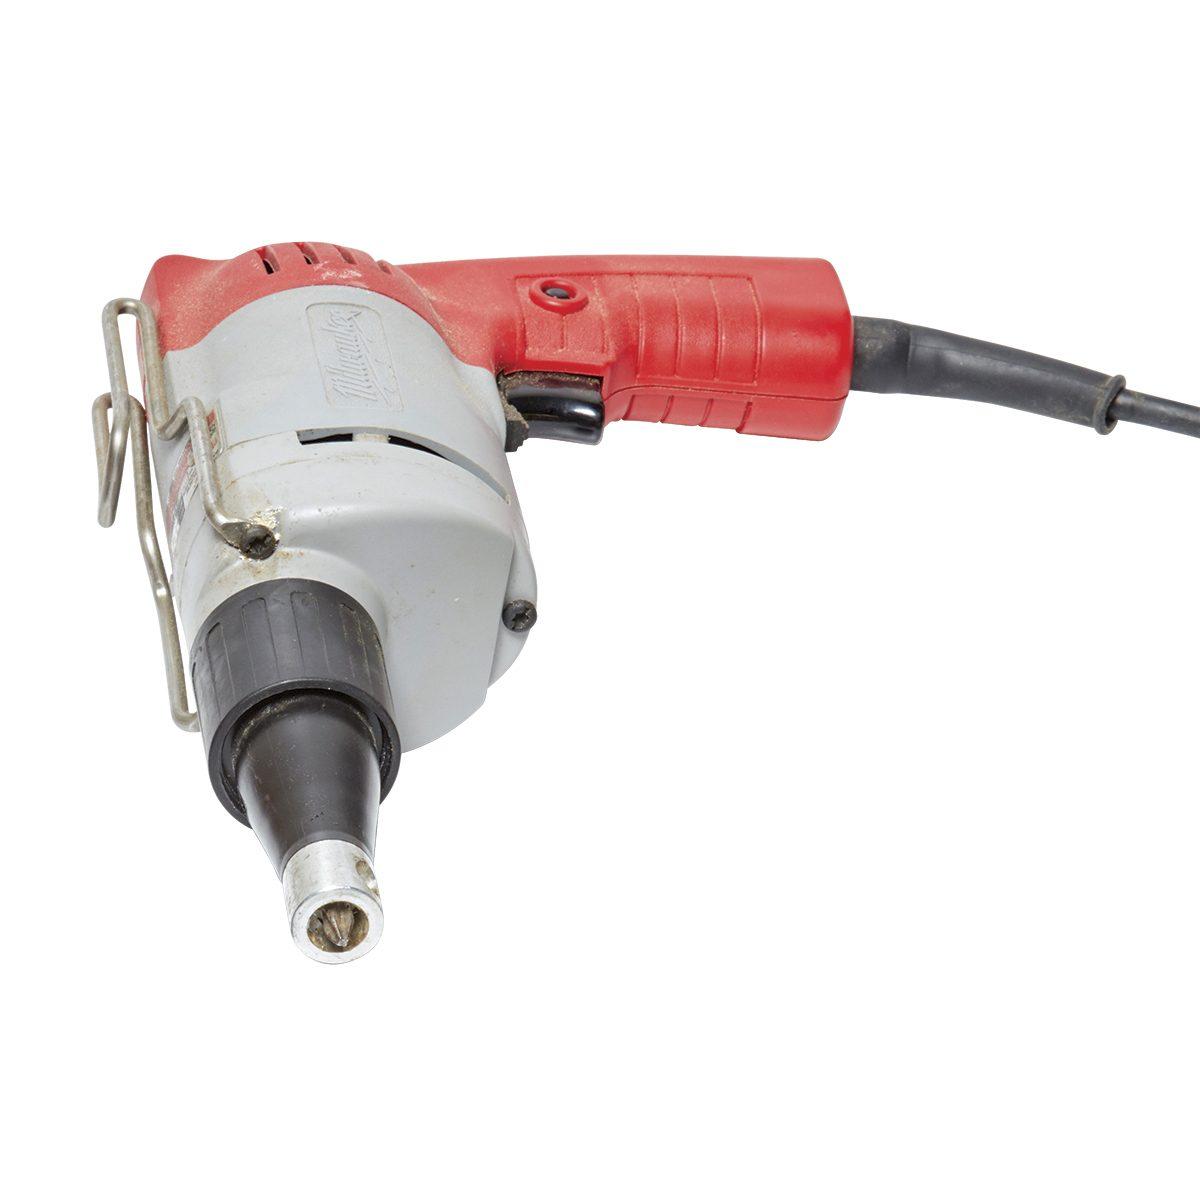 Corded drywall screw gun